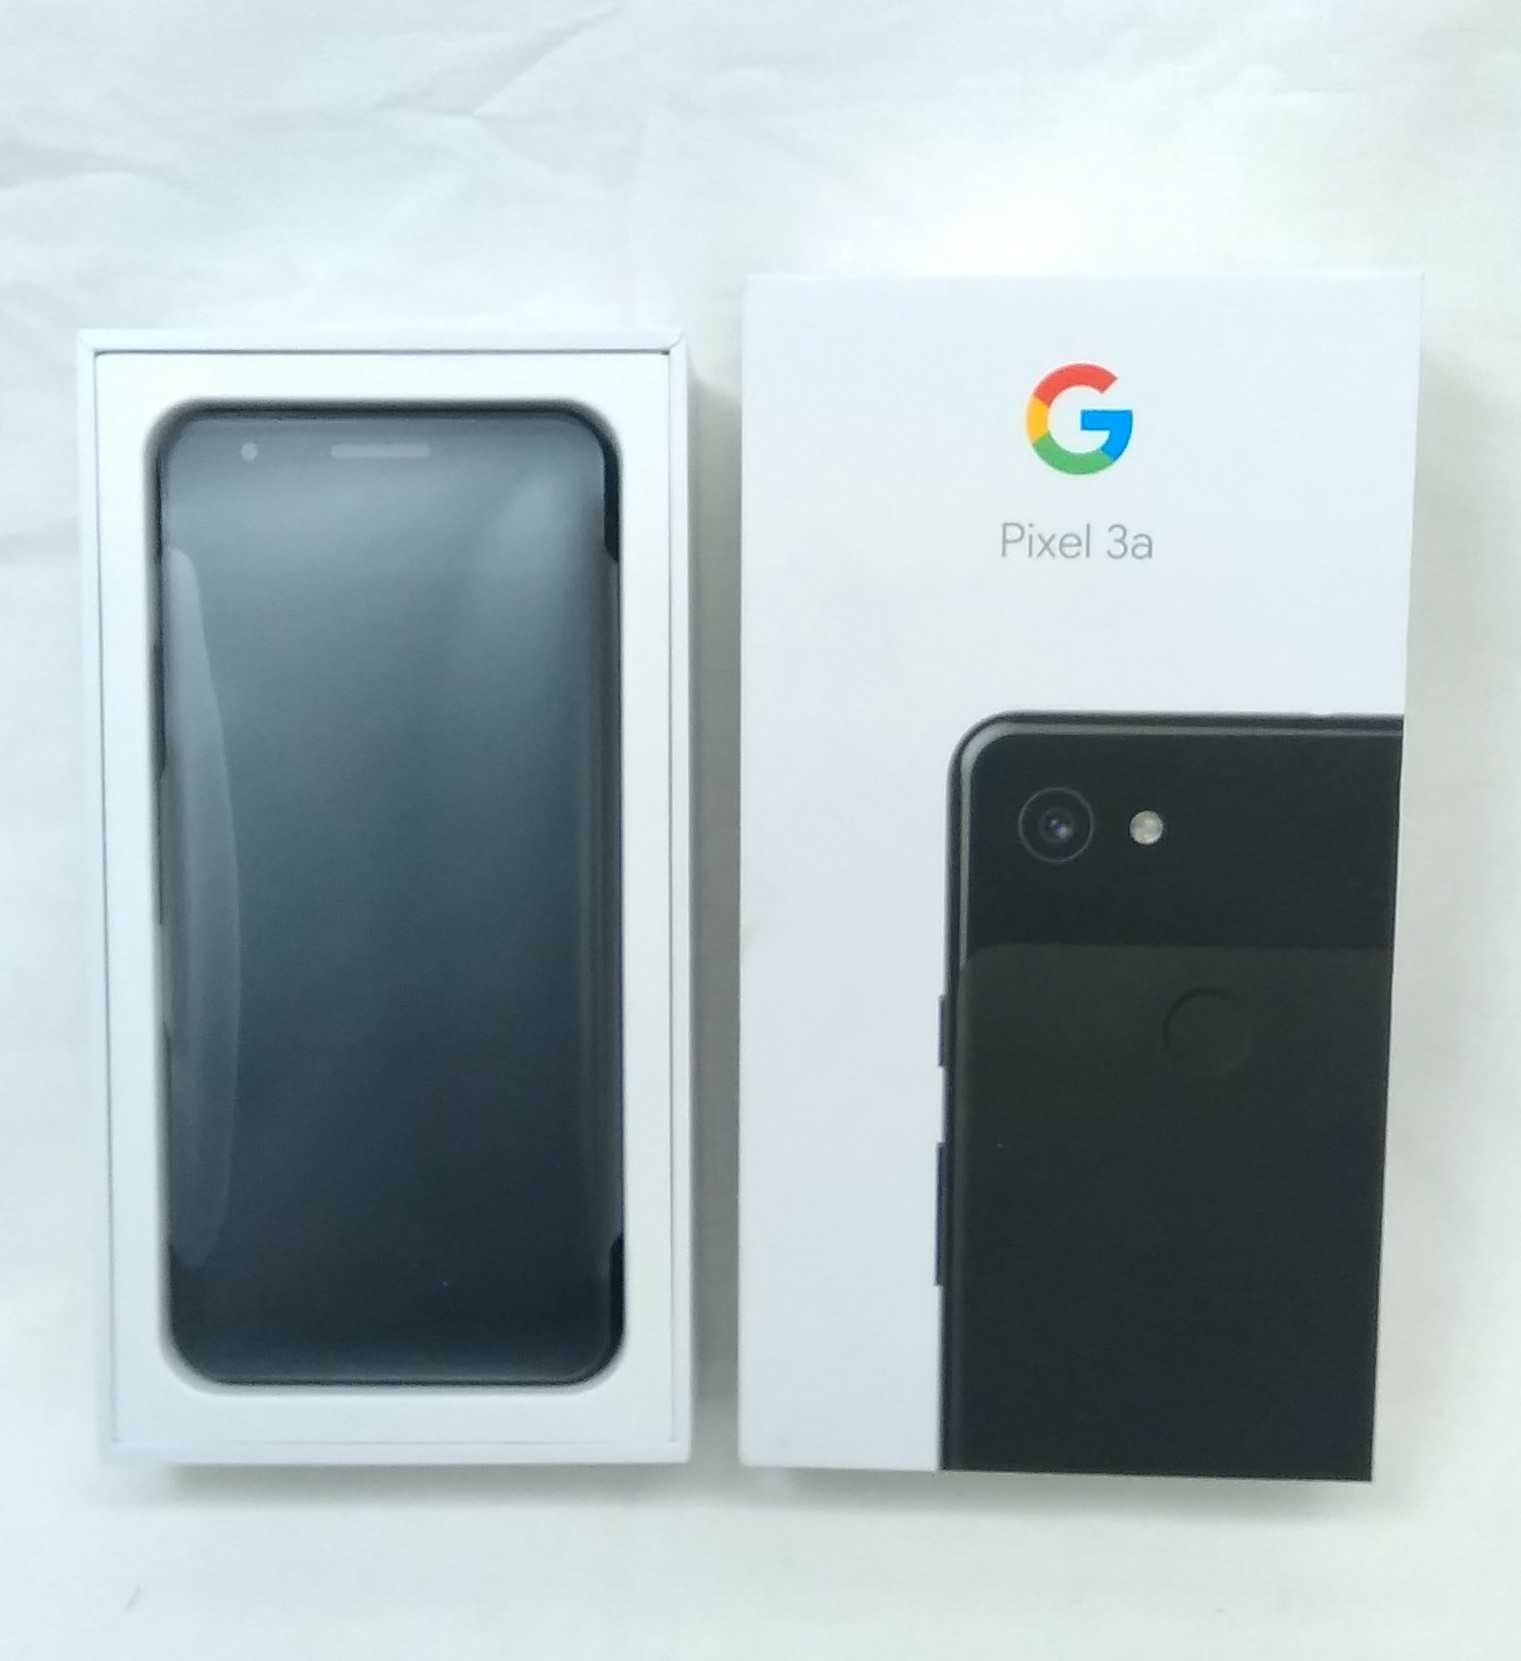 【未使用】スマ Google Pixel 3a(G020H) GOOGLE/SOFTBANK